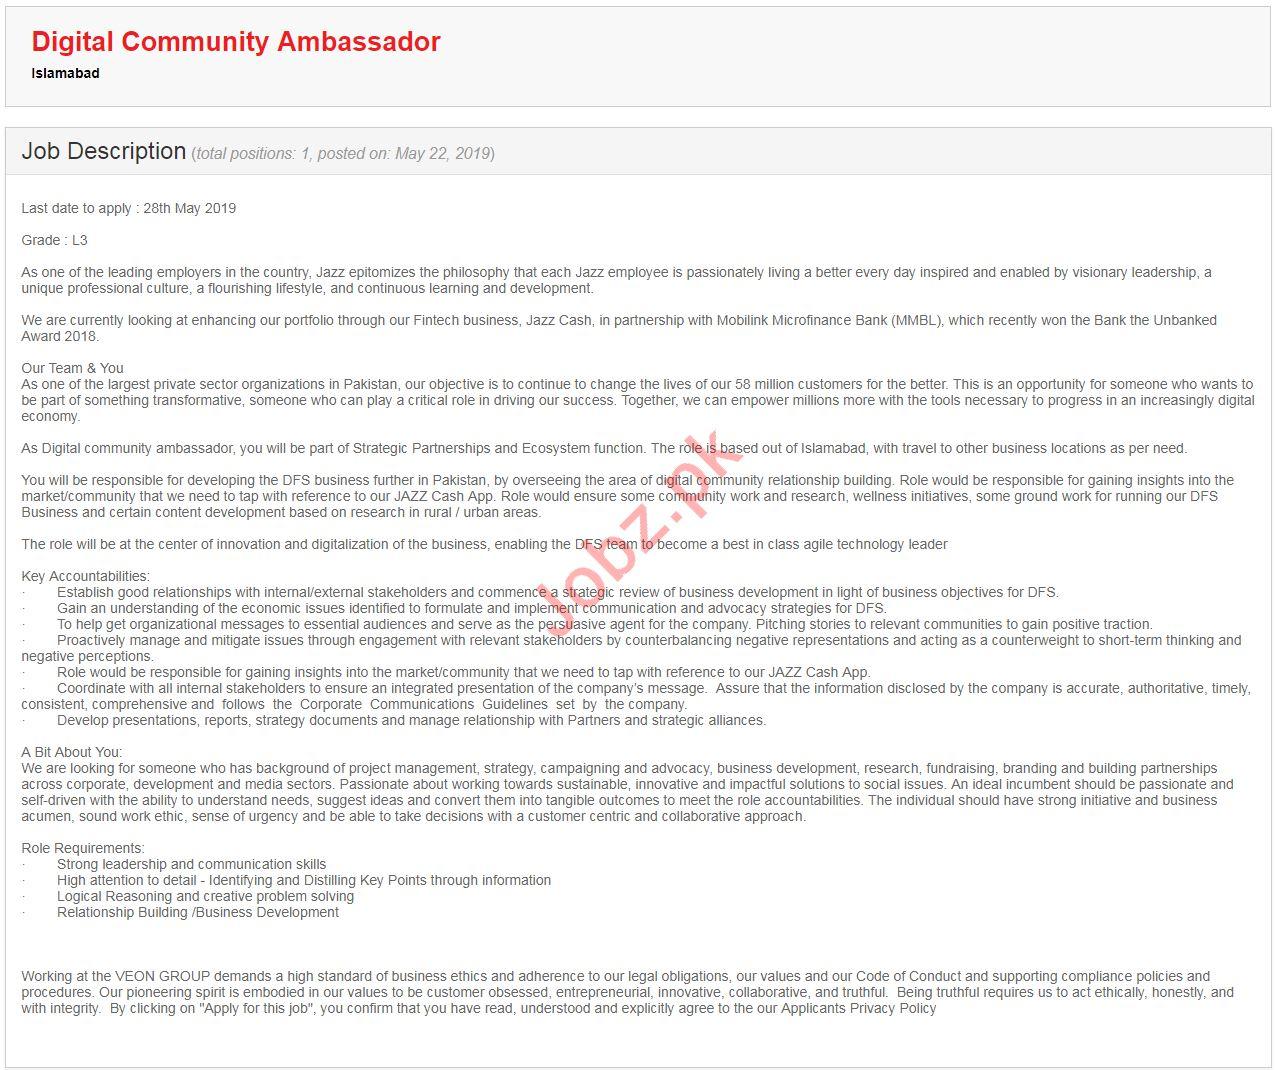 Digital Community Ambassador Jobs in Jazz Telecommunication